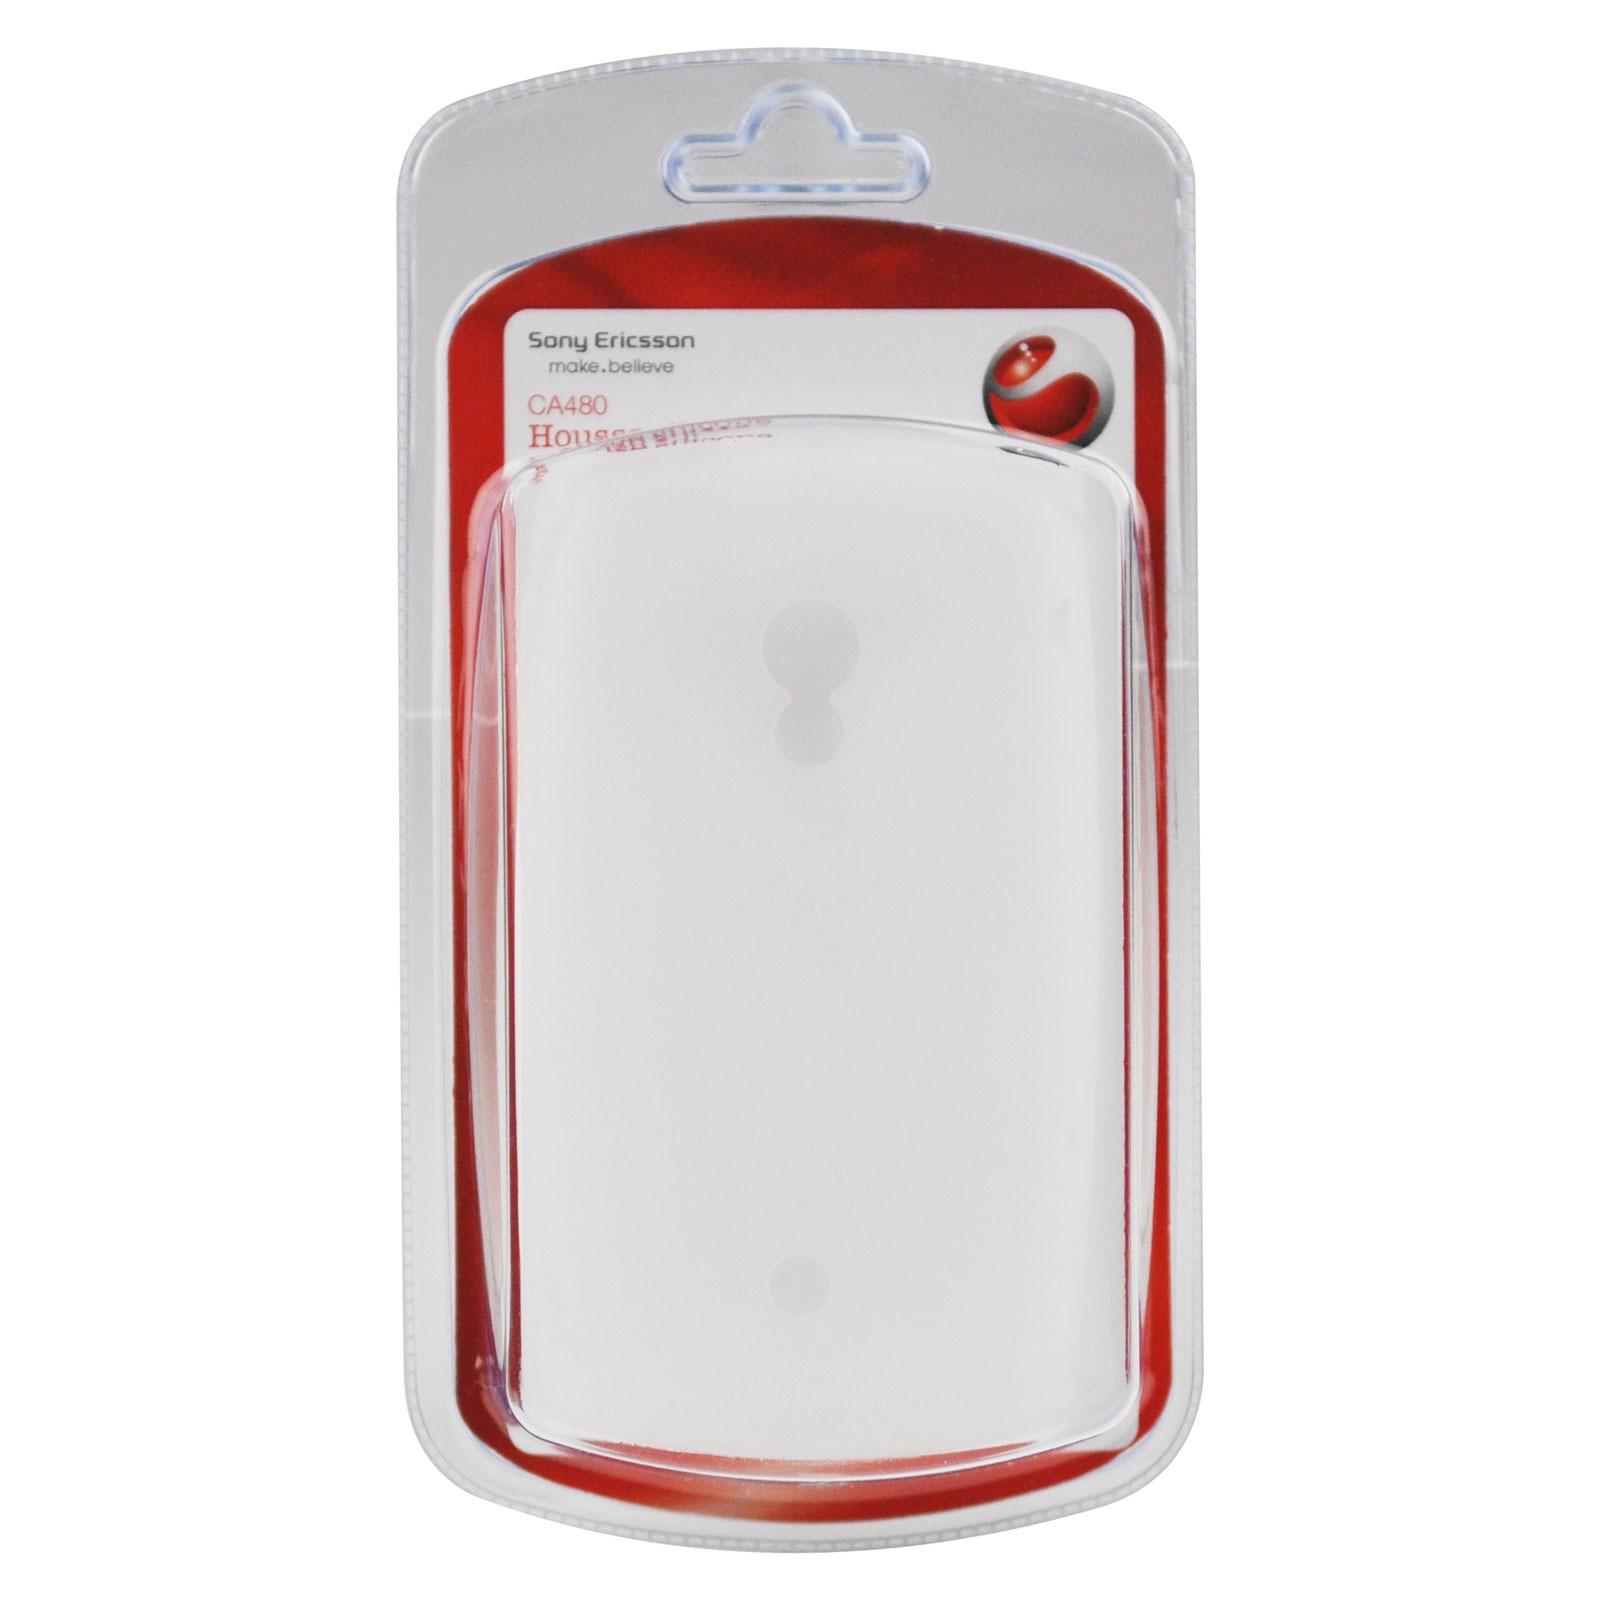 Etui téléphone Sony Ericsson CA480 Blanc Sony Ericsson CA480 Blanc - Housse en silicone pour Xperia X10